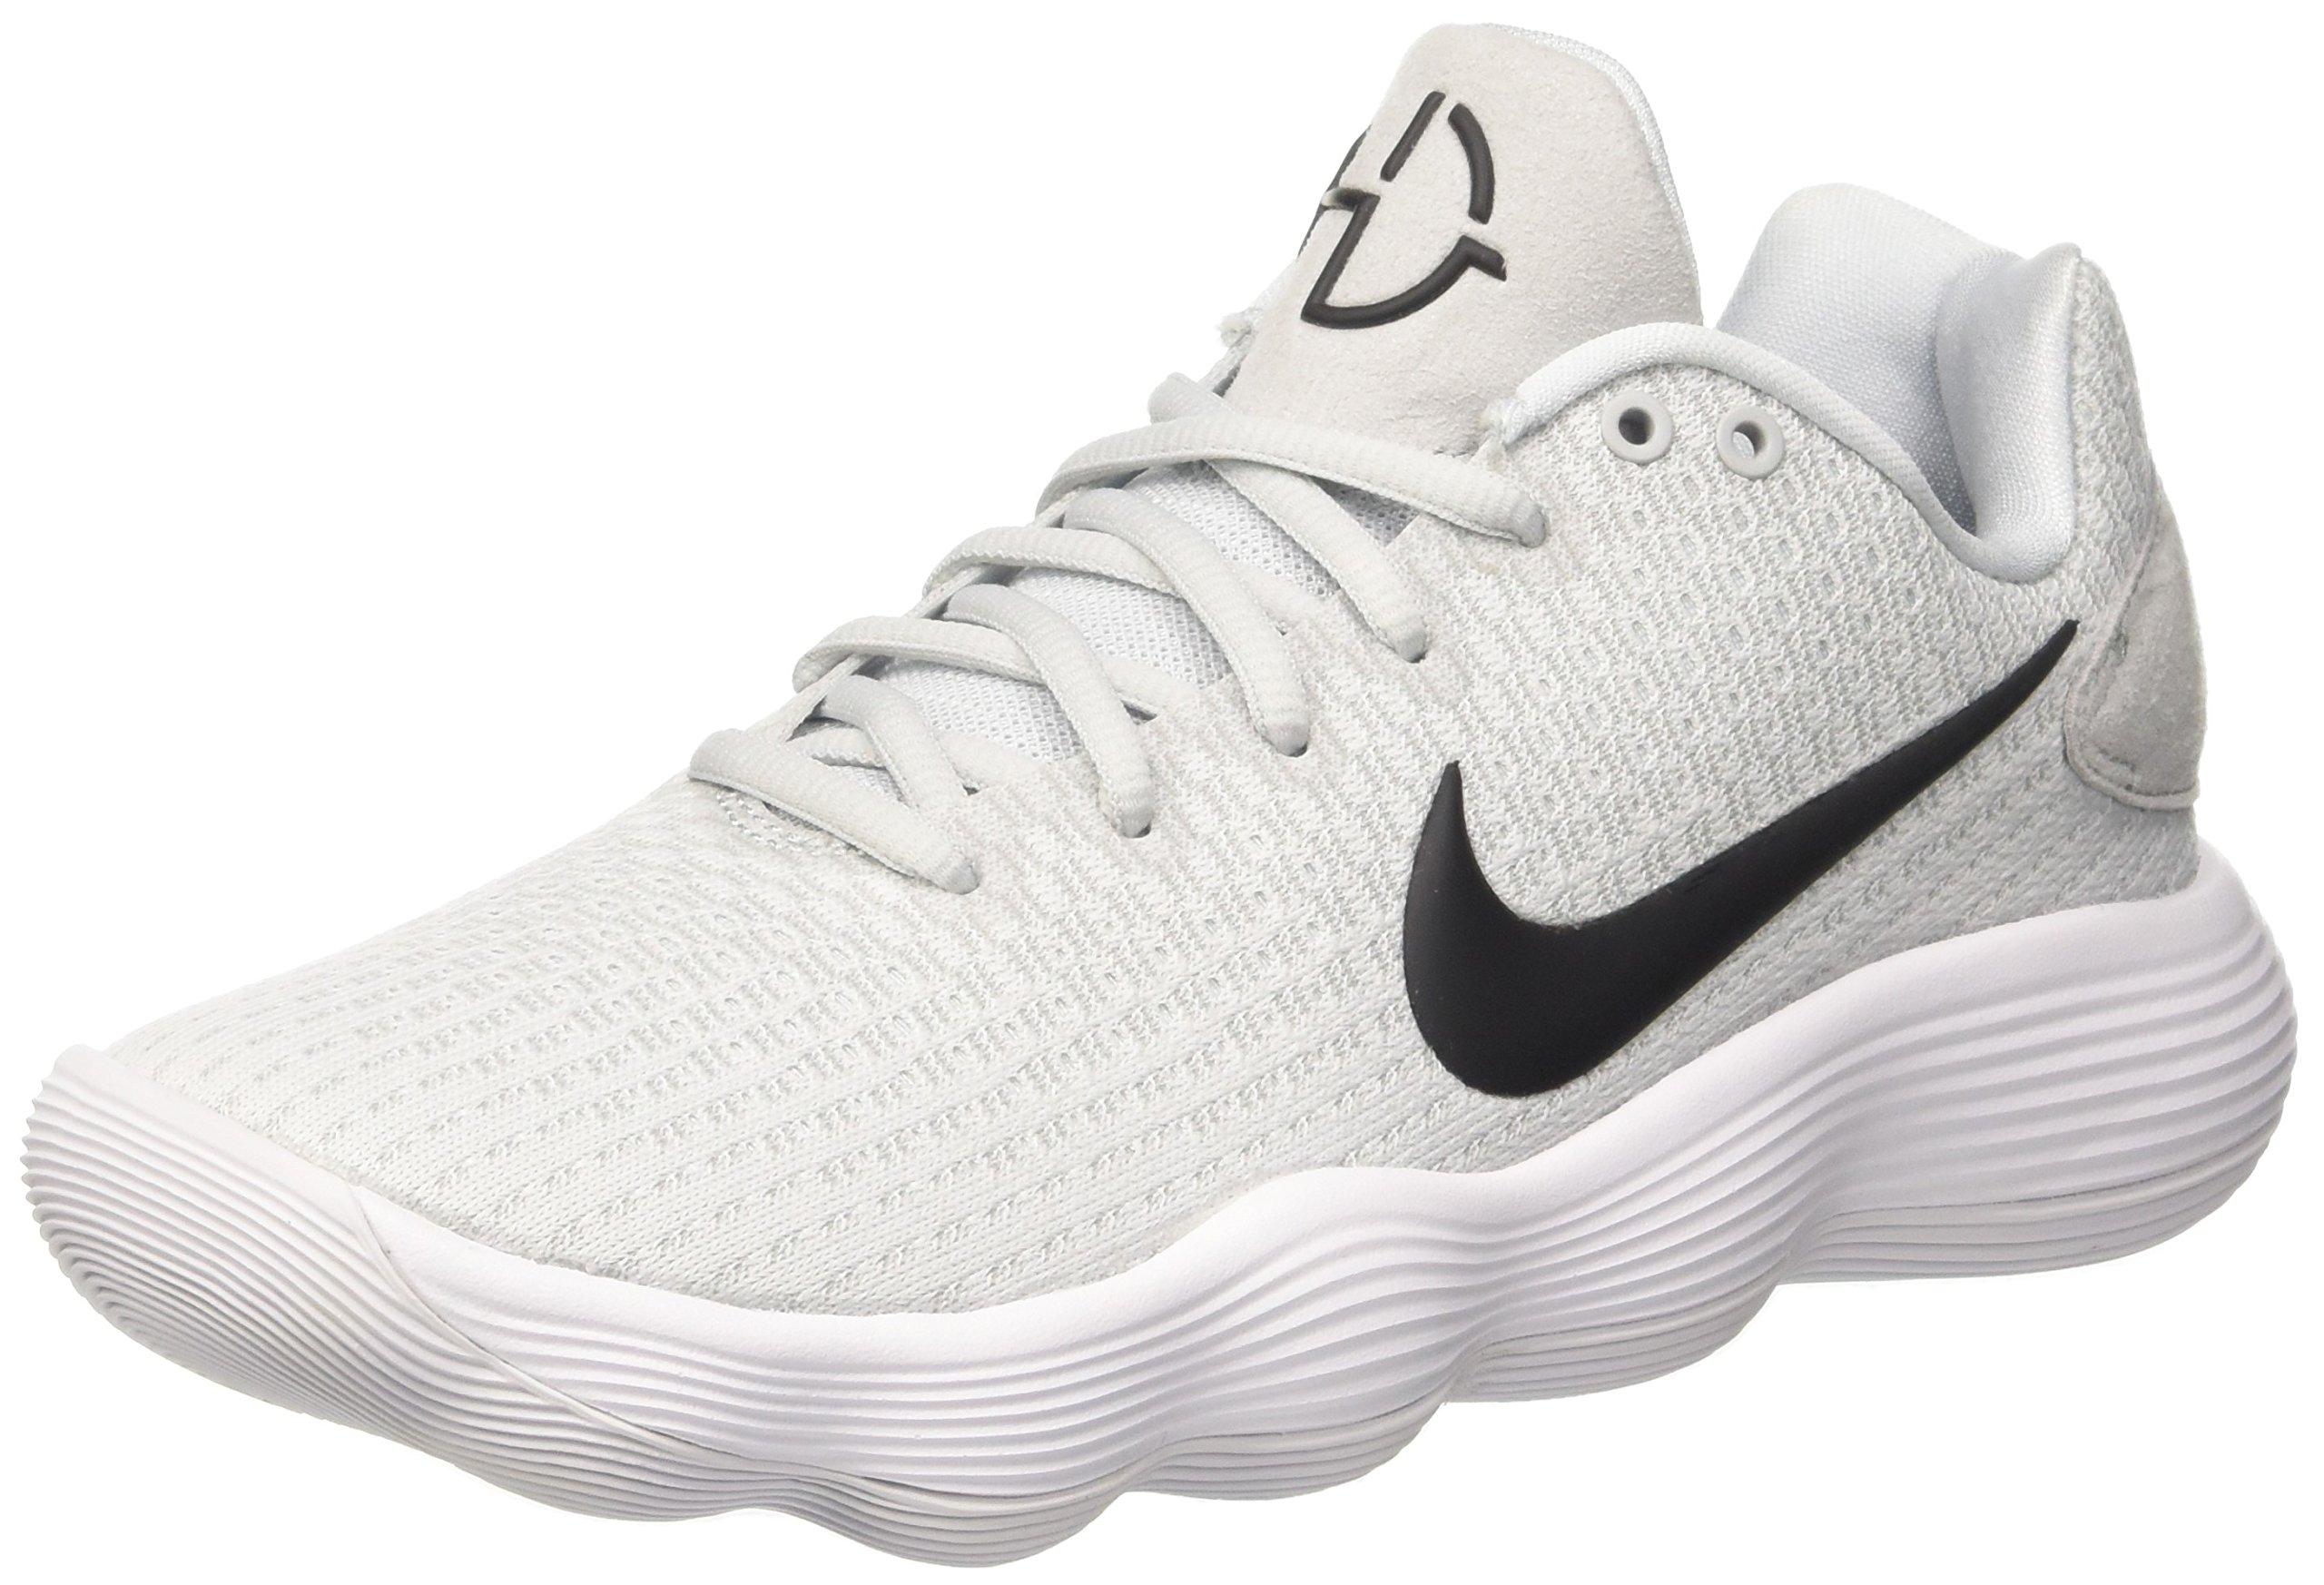 58d6544e52cd Galleon - Men s Nike Hyperdunk 2017 Low Basketball Shoe